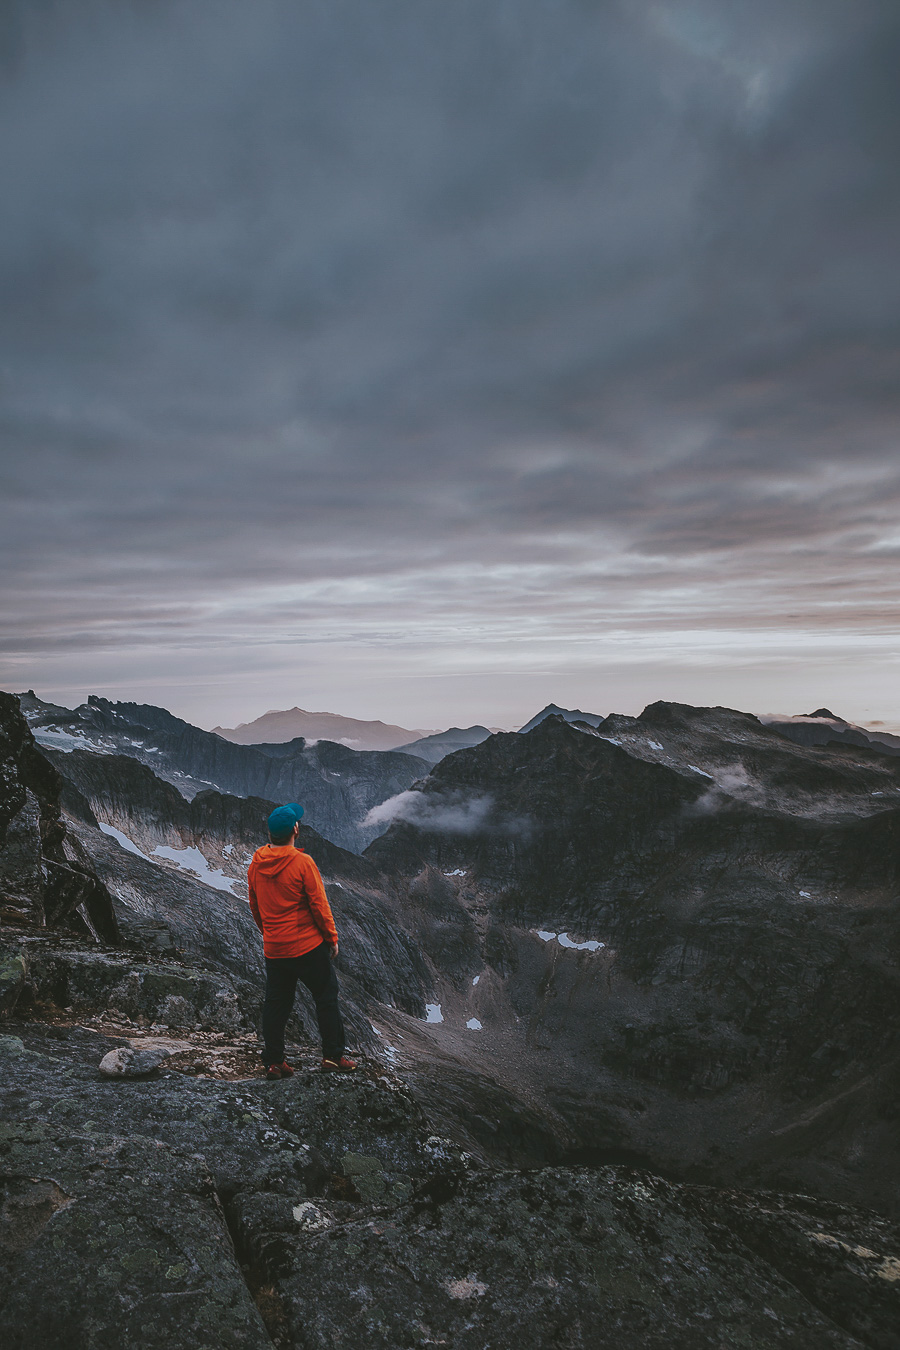 Man in orange jacket on the top of Store blåmann